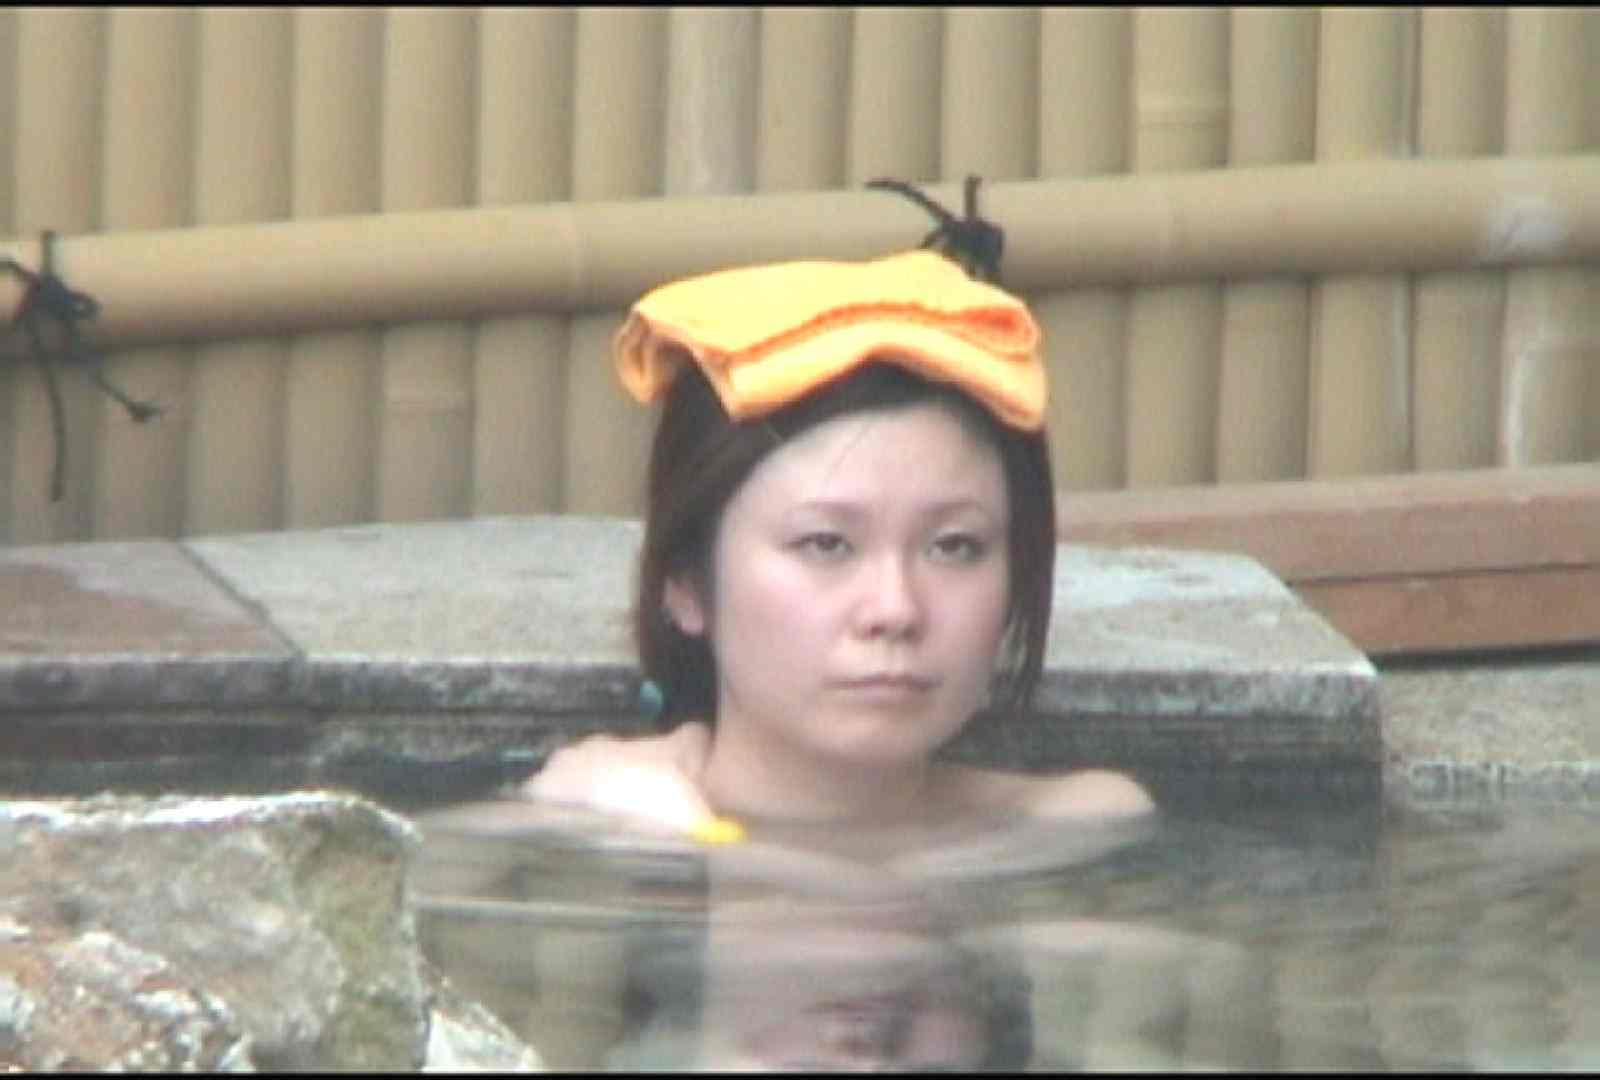 Aquaな露天風呂Vol.177 盗撮師作品  102pic 15